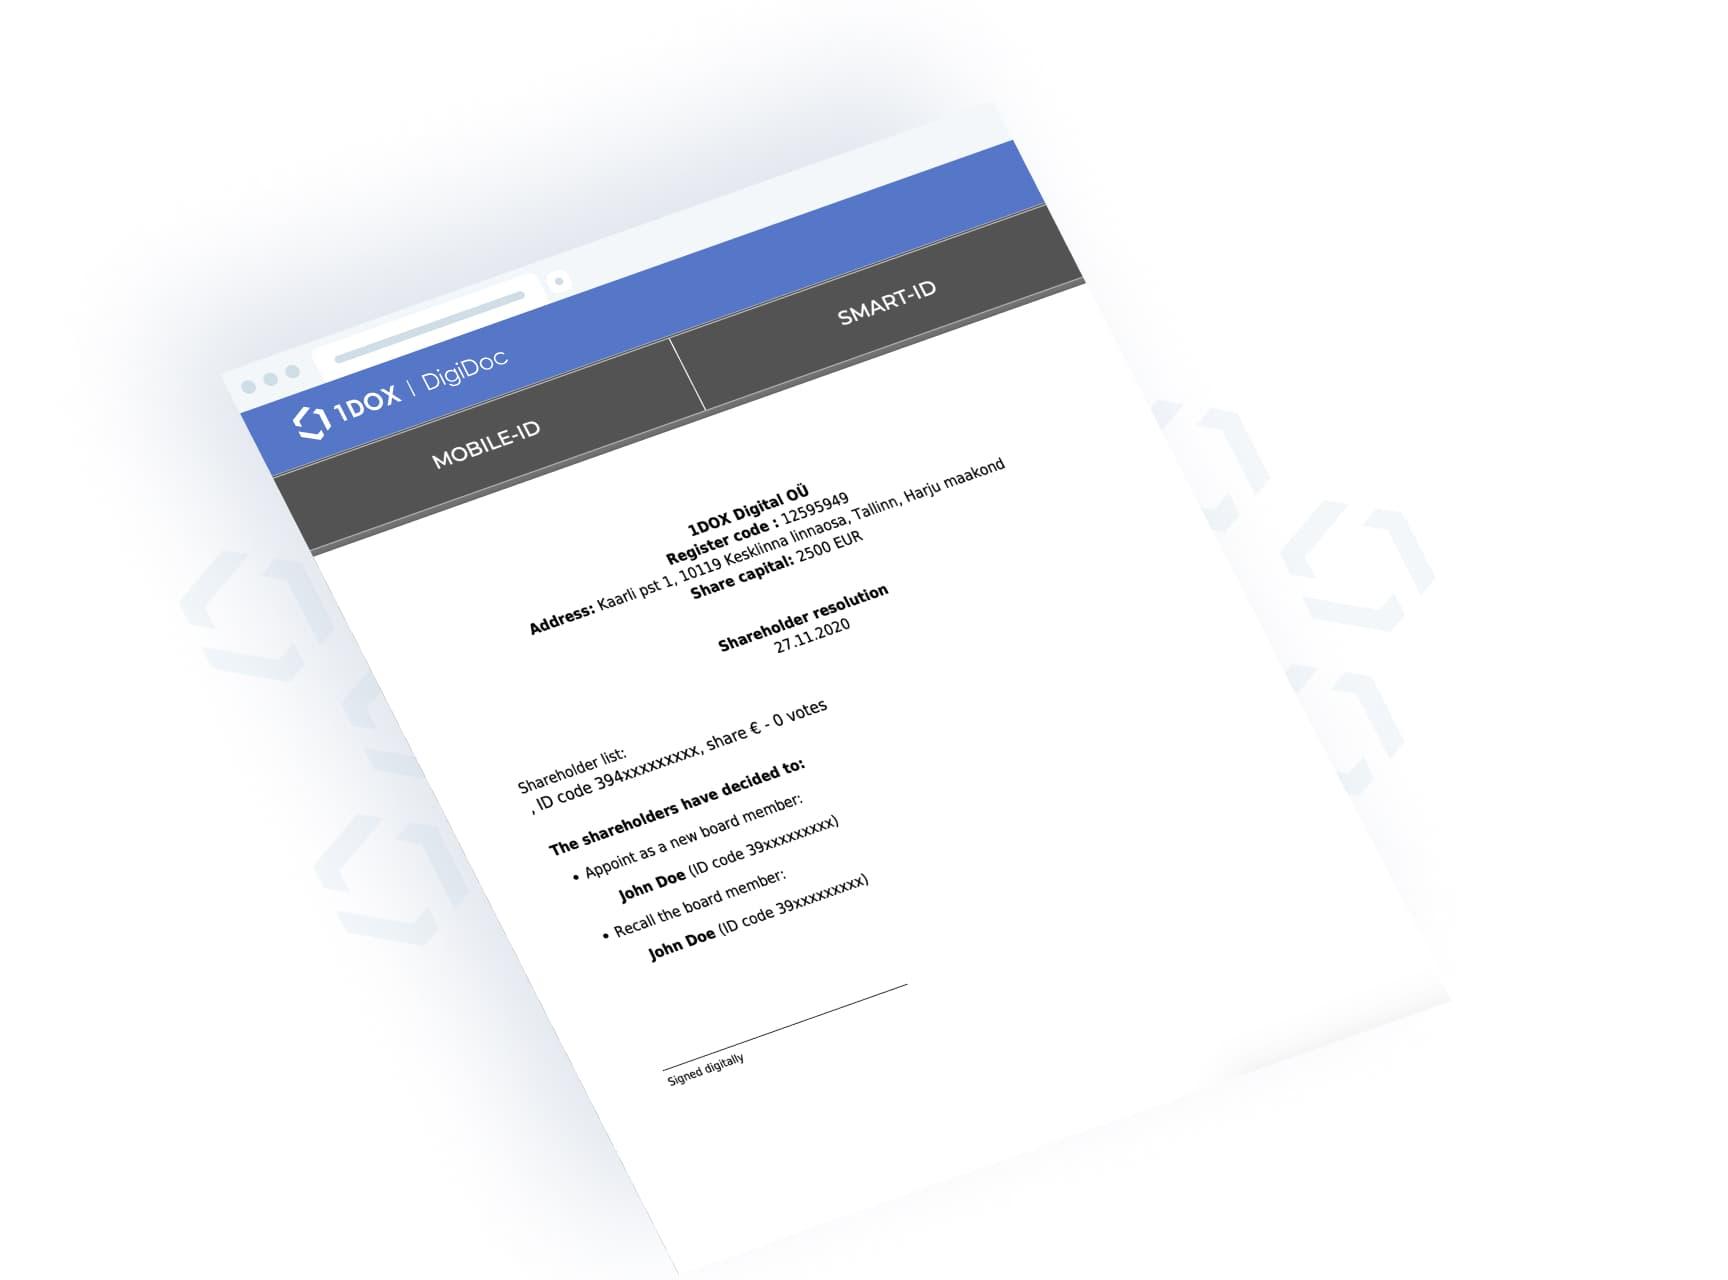 1DOX Digital - Dokumentide digiallkirjastamine